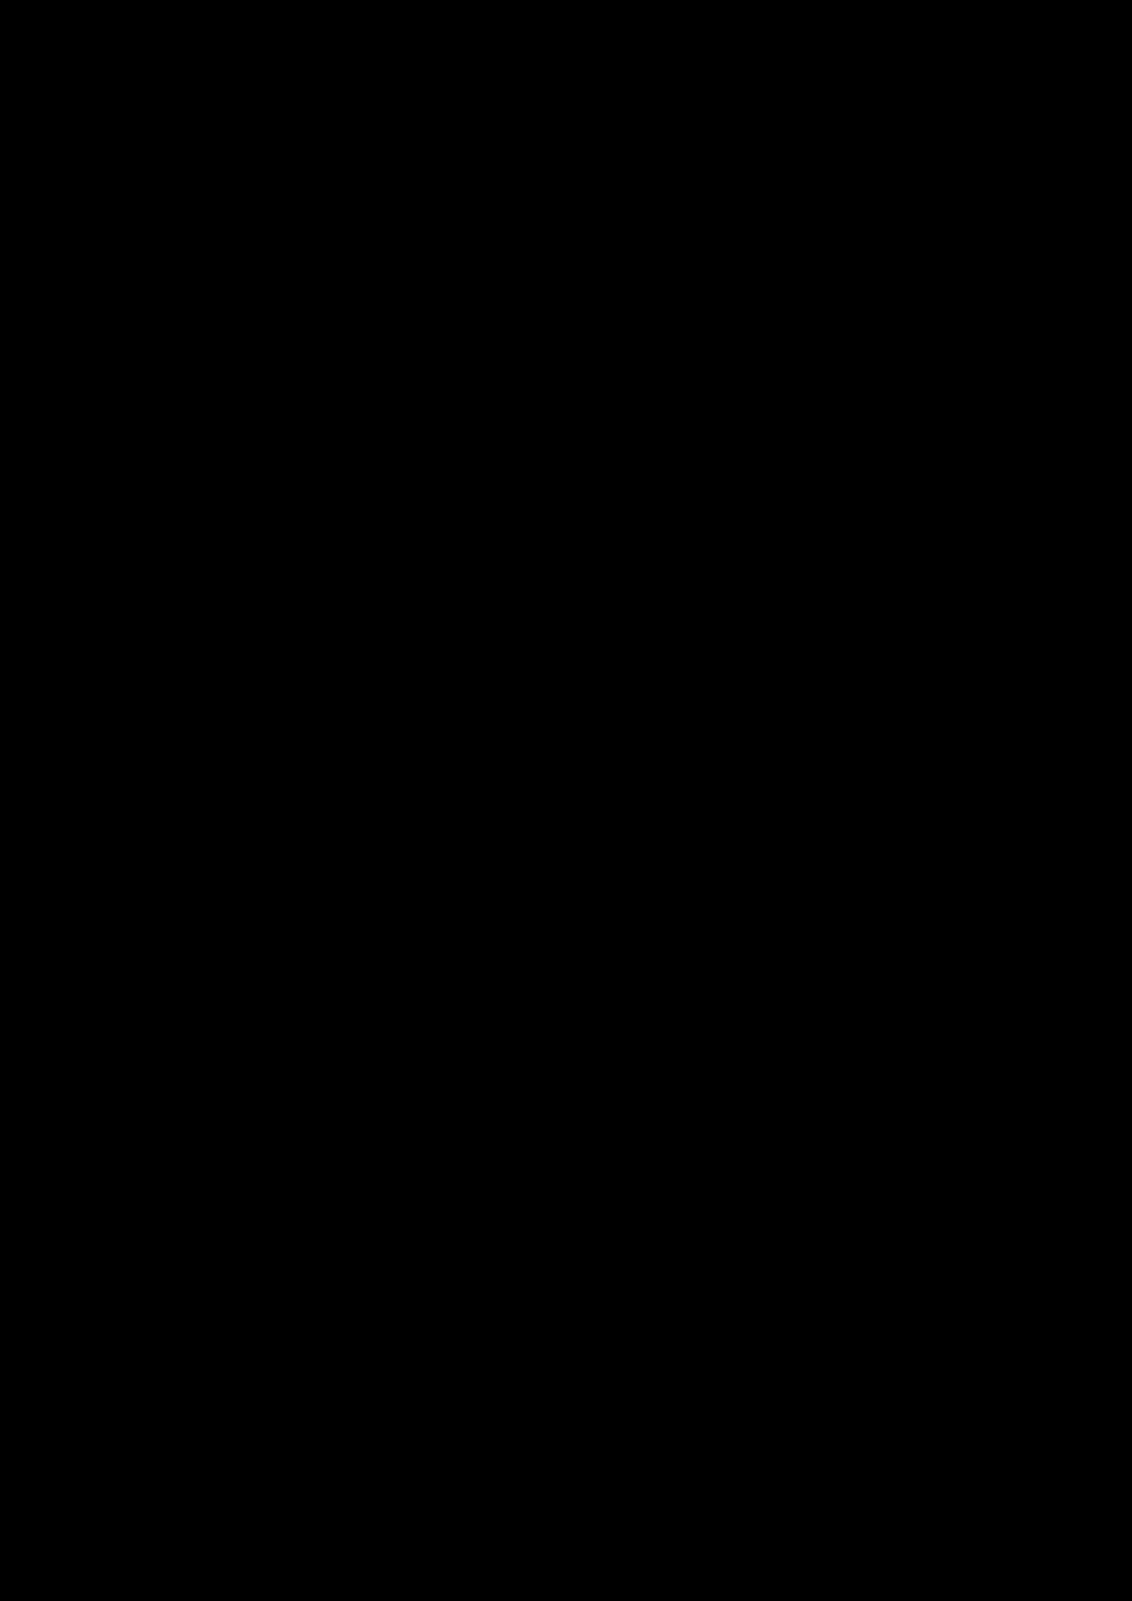 Ot Bolshogo Uma slide, Image 13